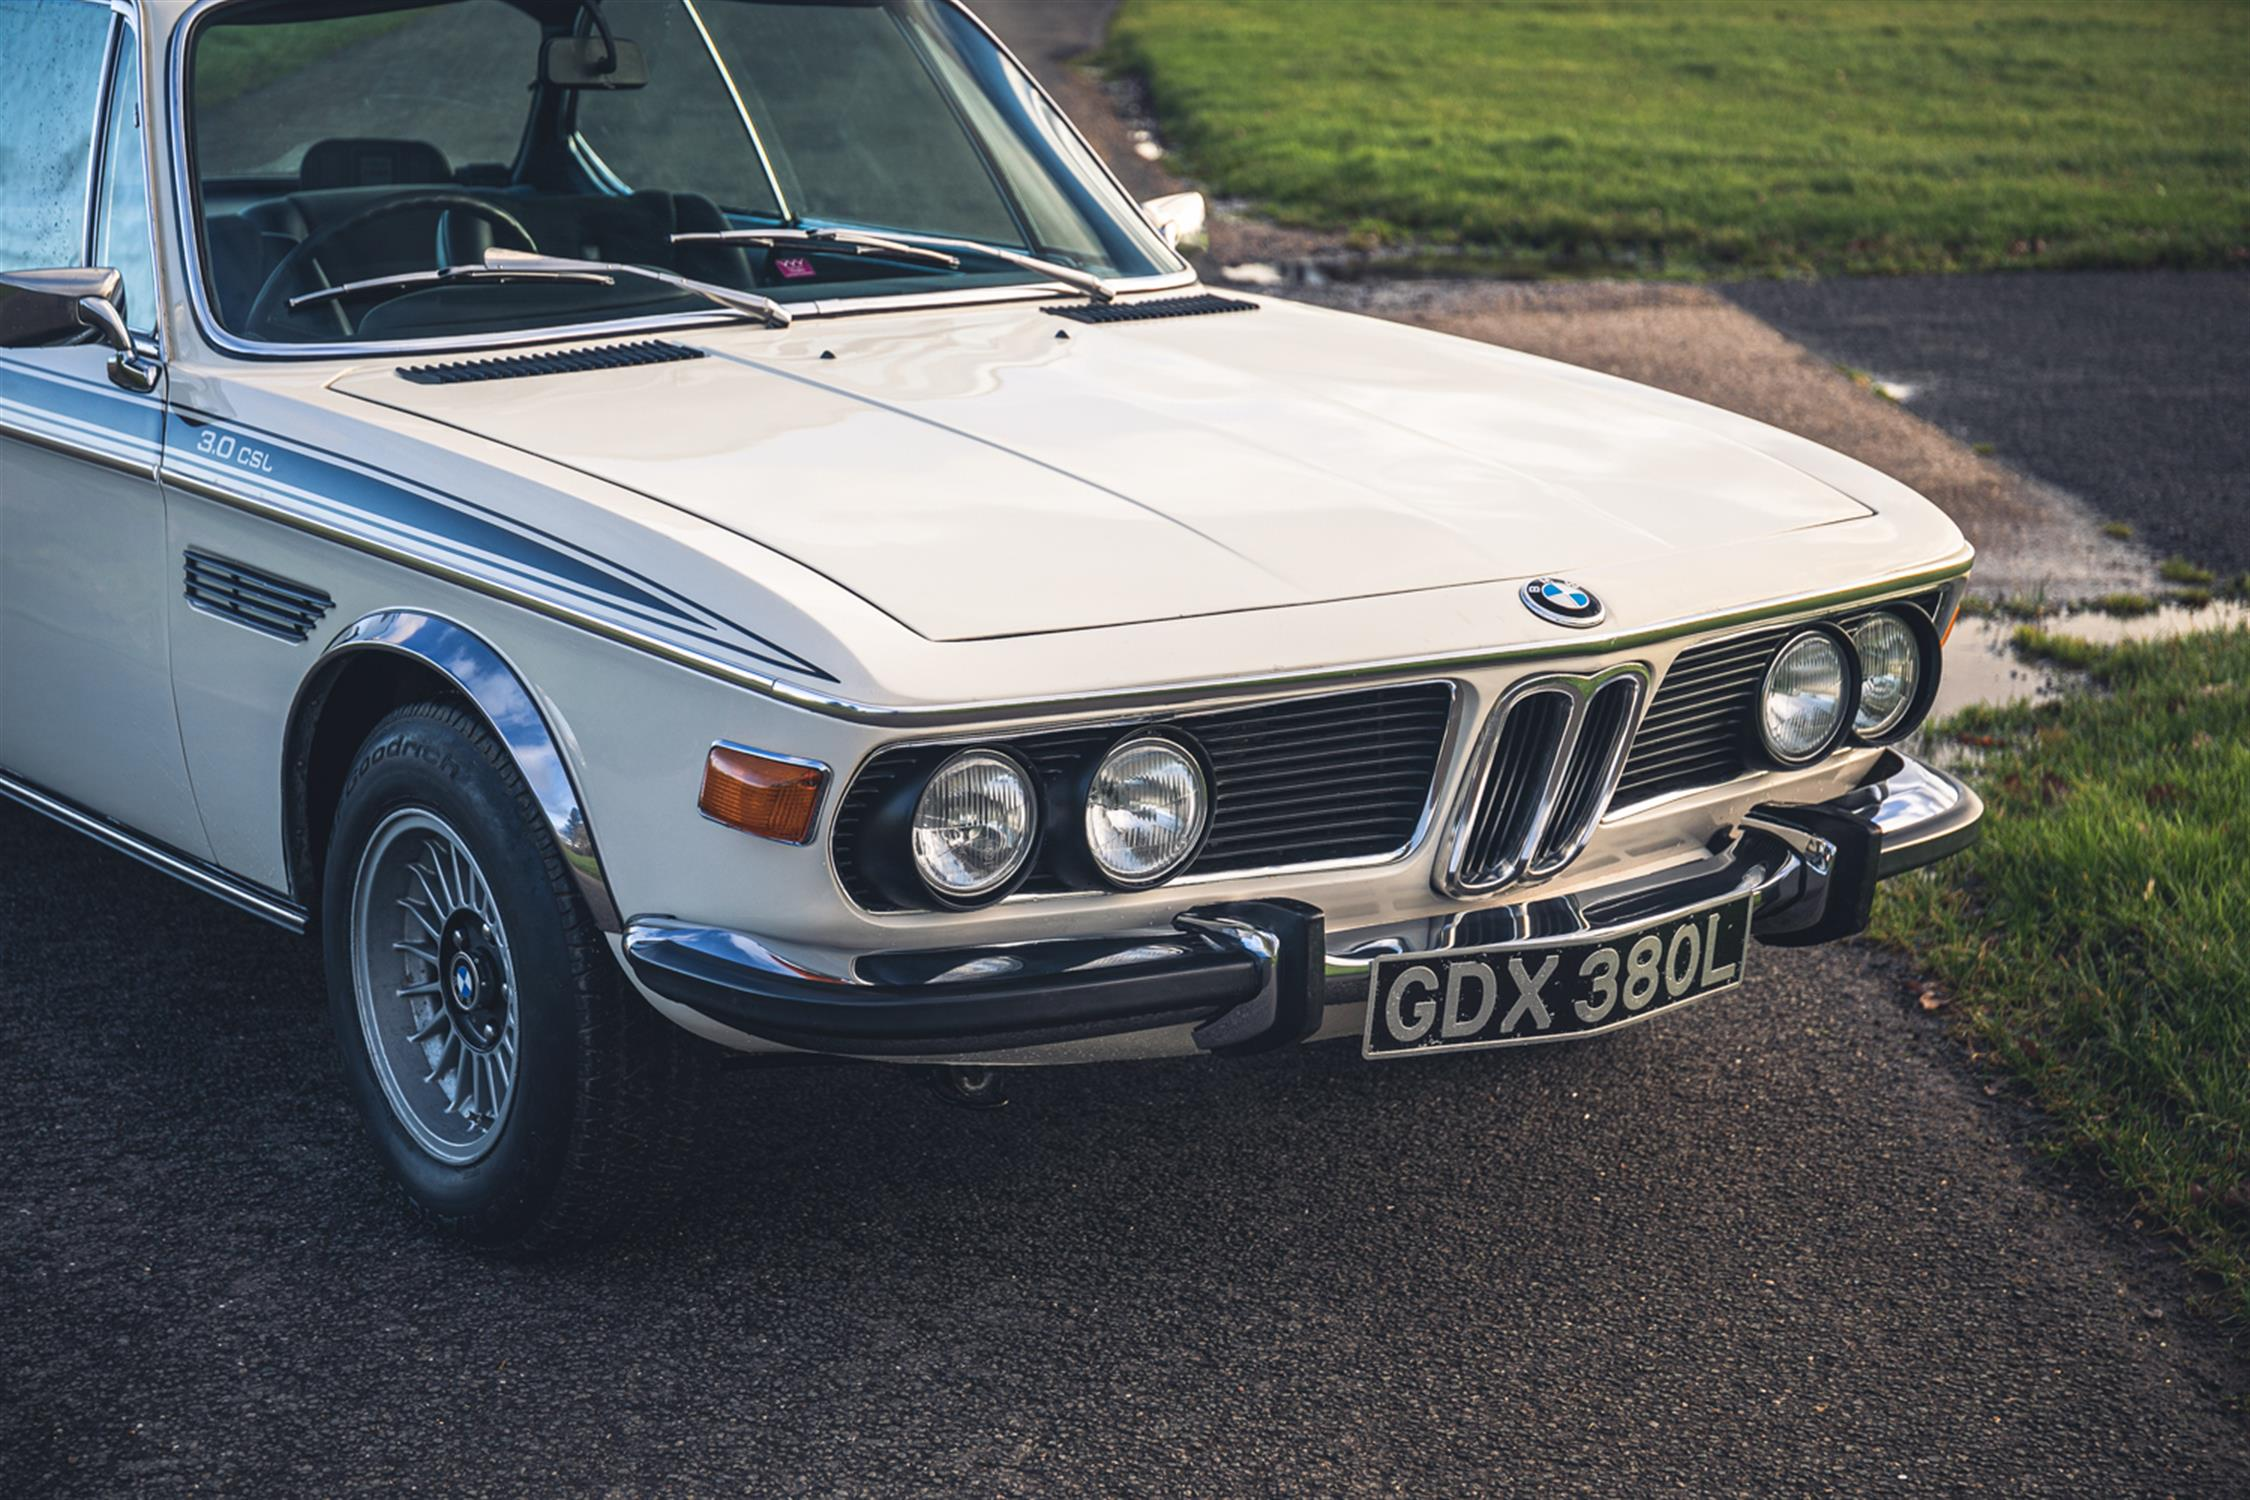 1973 BMW 3.0 CSL - Image 9 of 10